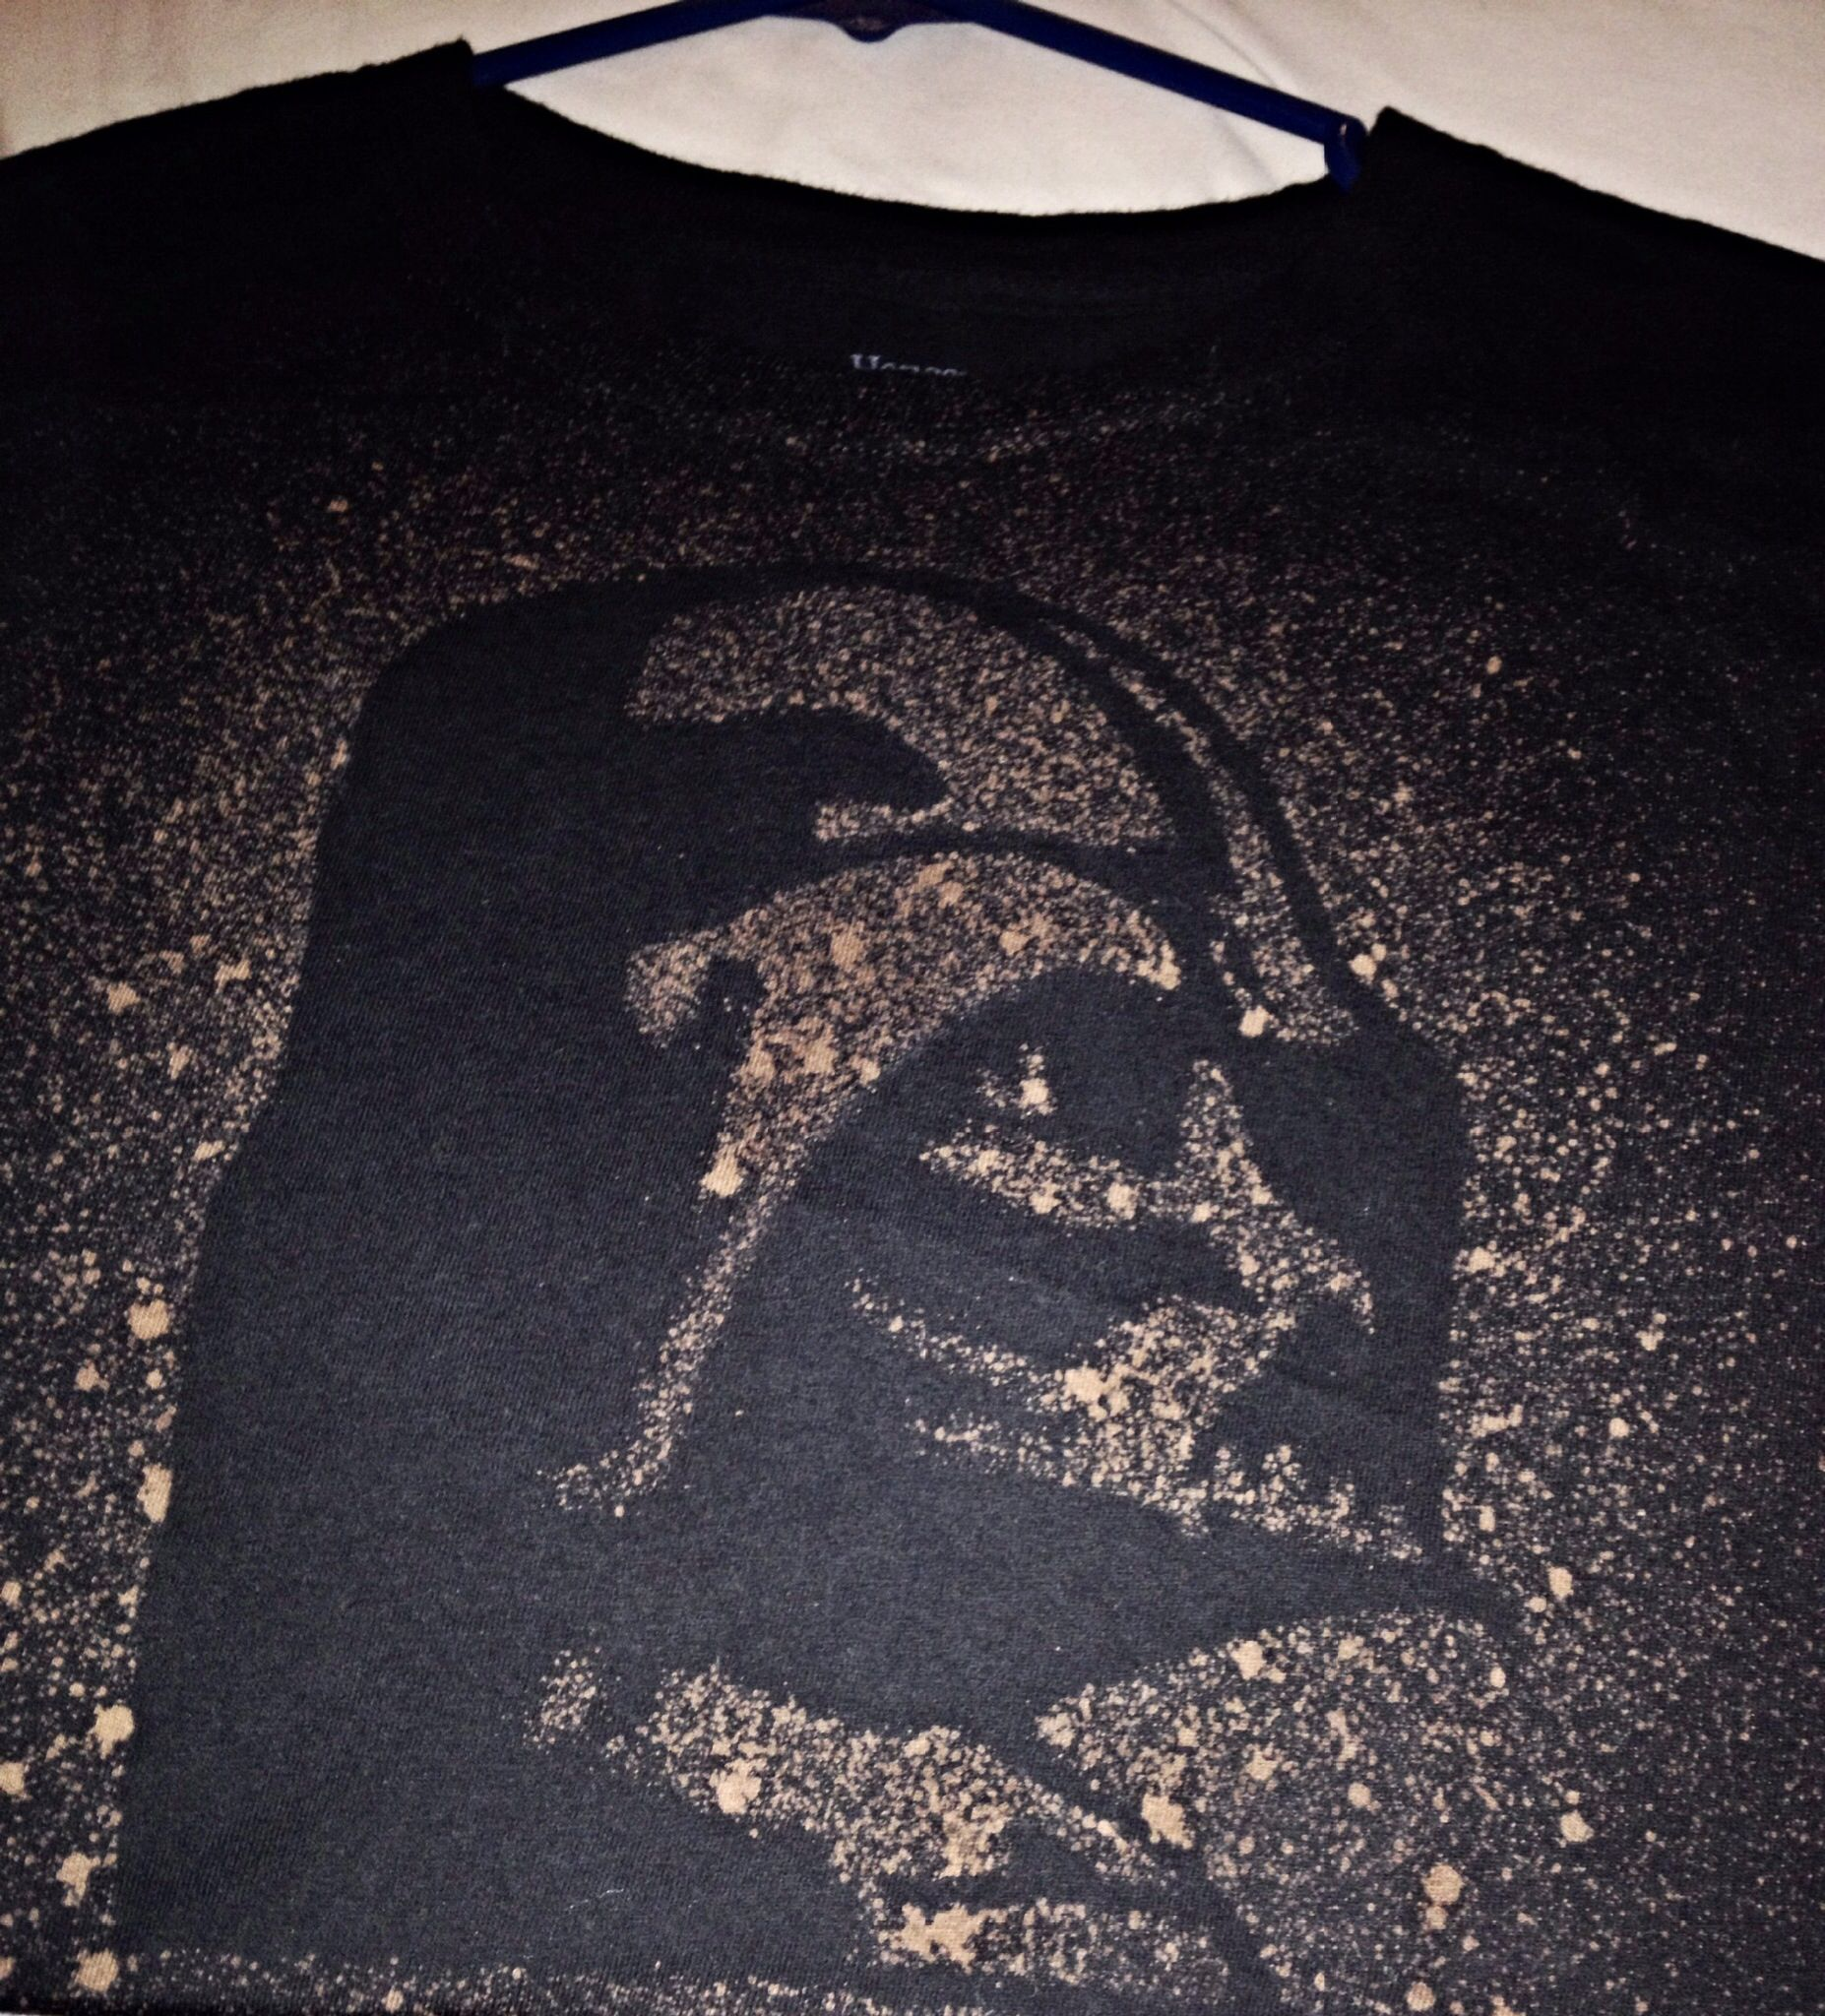 Diy star wars shirt darth vader stencil then spray bleach for Diy disney shirt template